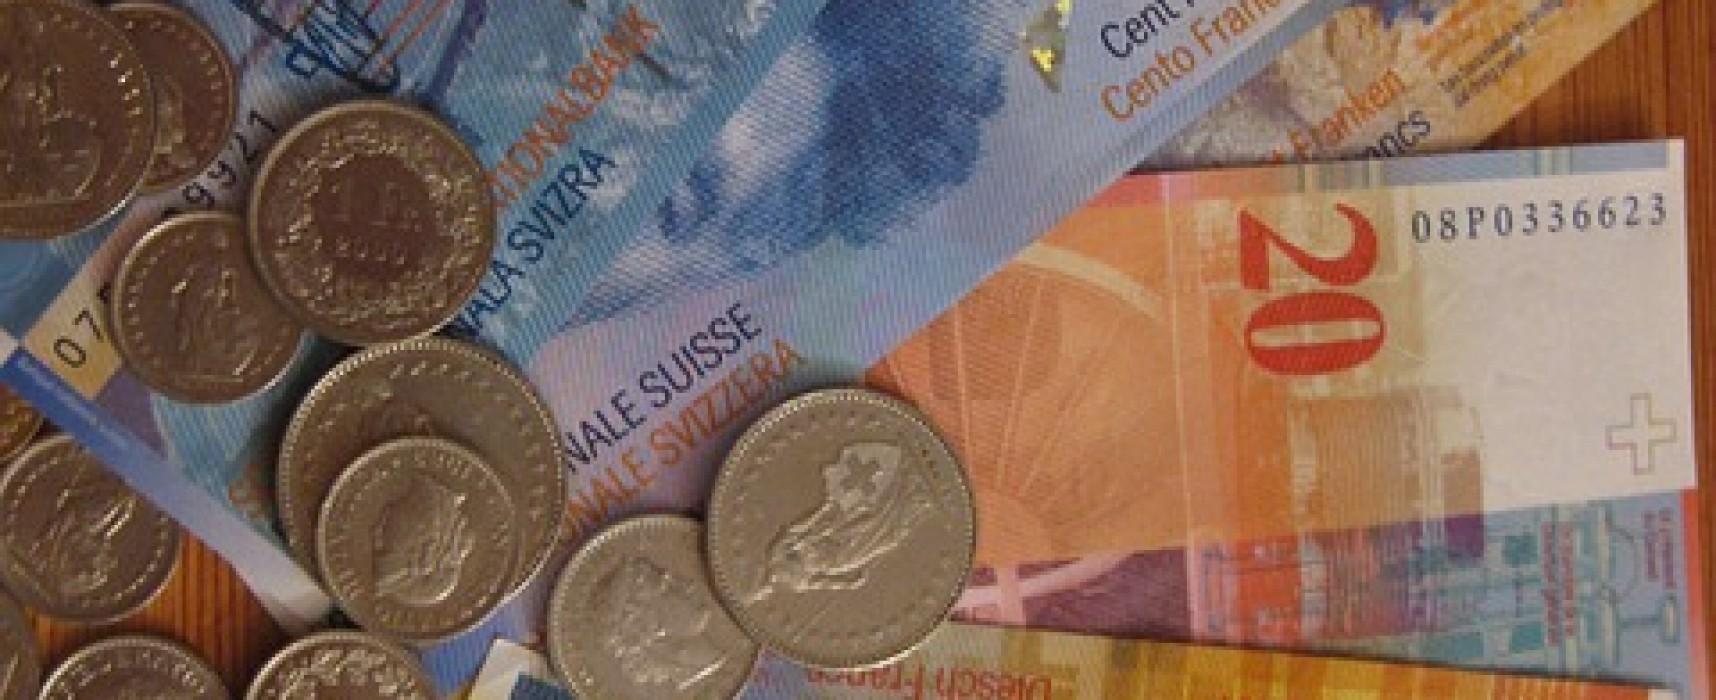 Schulden Thusis: Tipp an den Gemeinderat